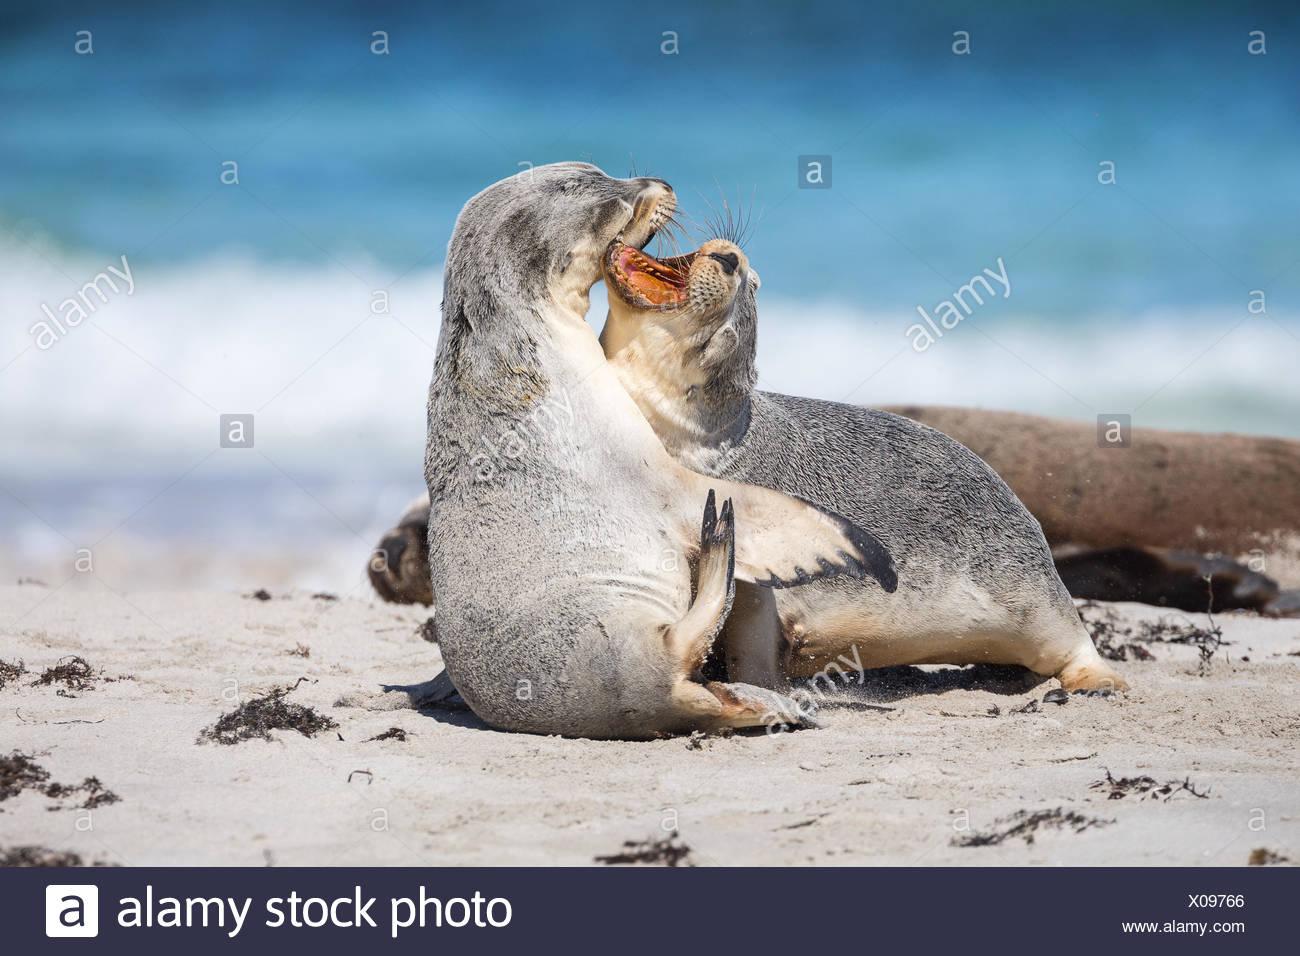 Junge Australische Seelöwen, Neophoca cinerea mouthing jedes anderen am Strand. Stockbild